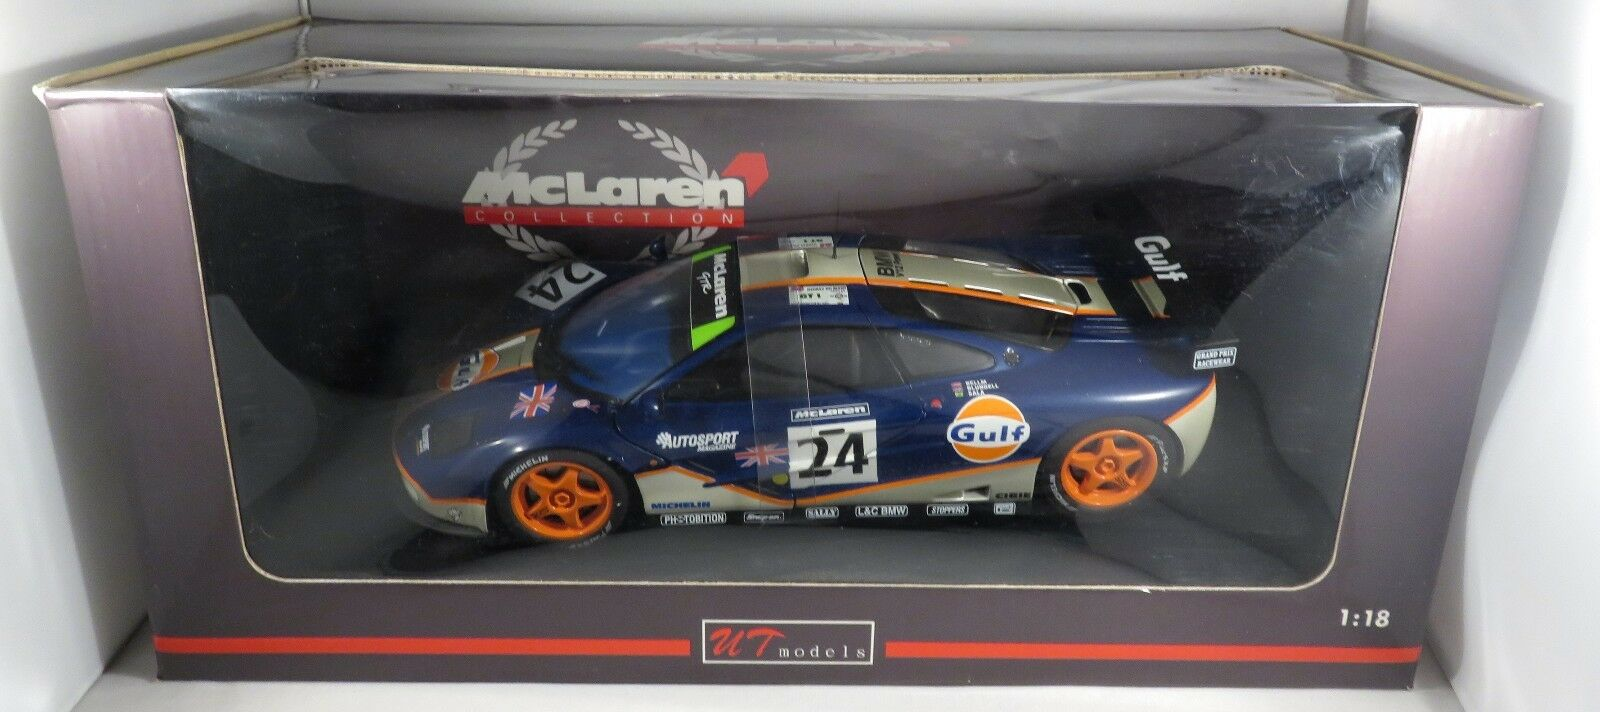 MCLAREN BMW F1 GTR GT1 bluendell Sala Bellm GULF GTC 4th LE MANS 1995 UT 1 18